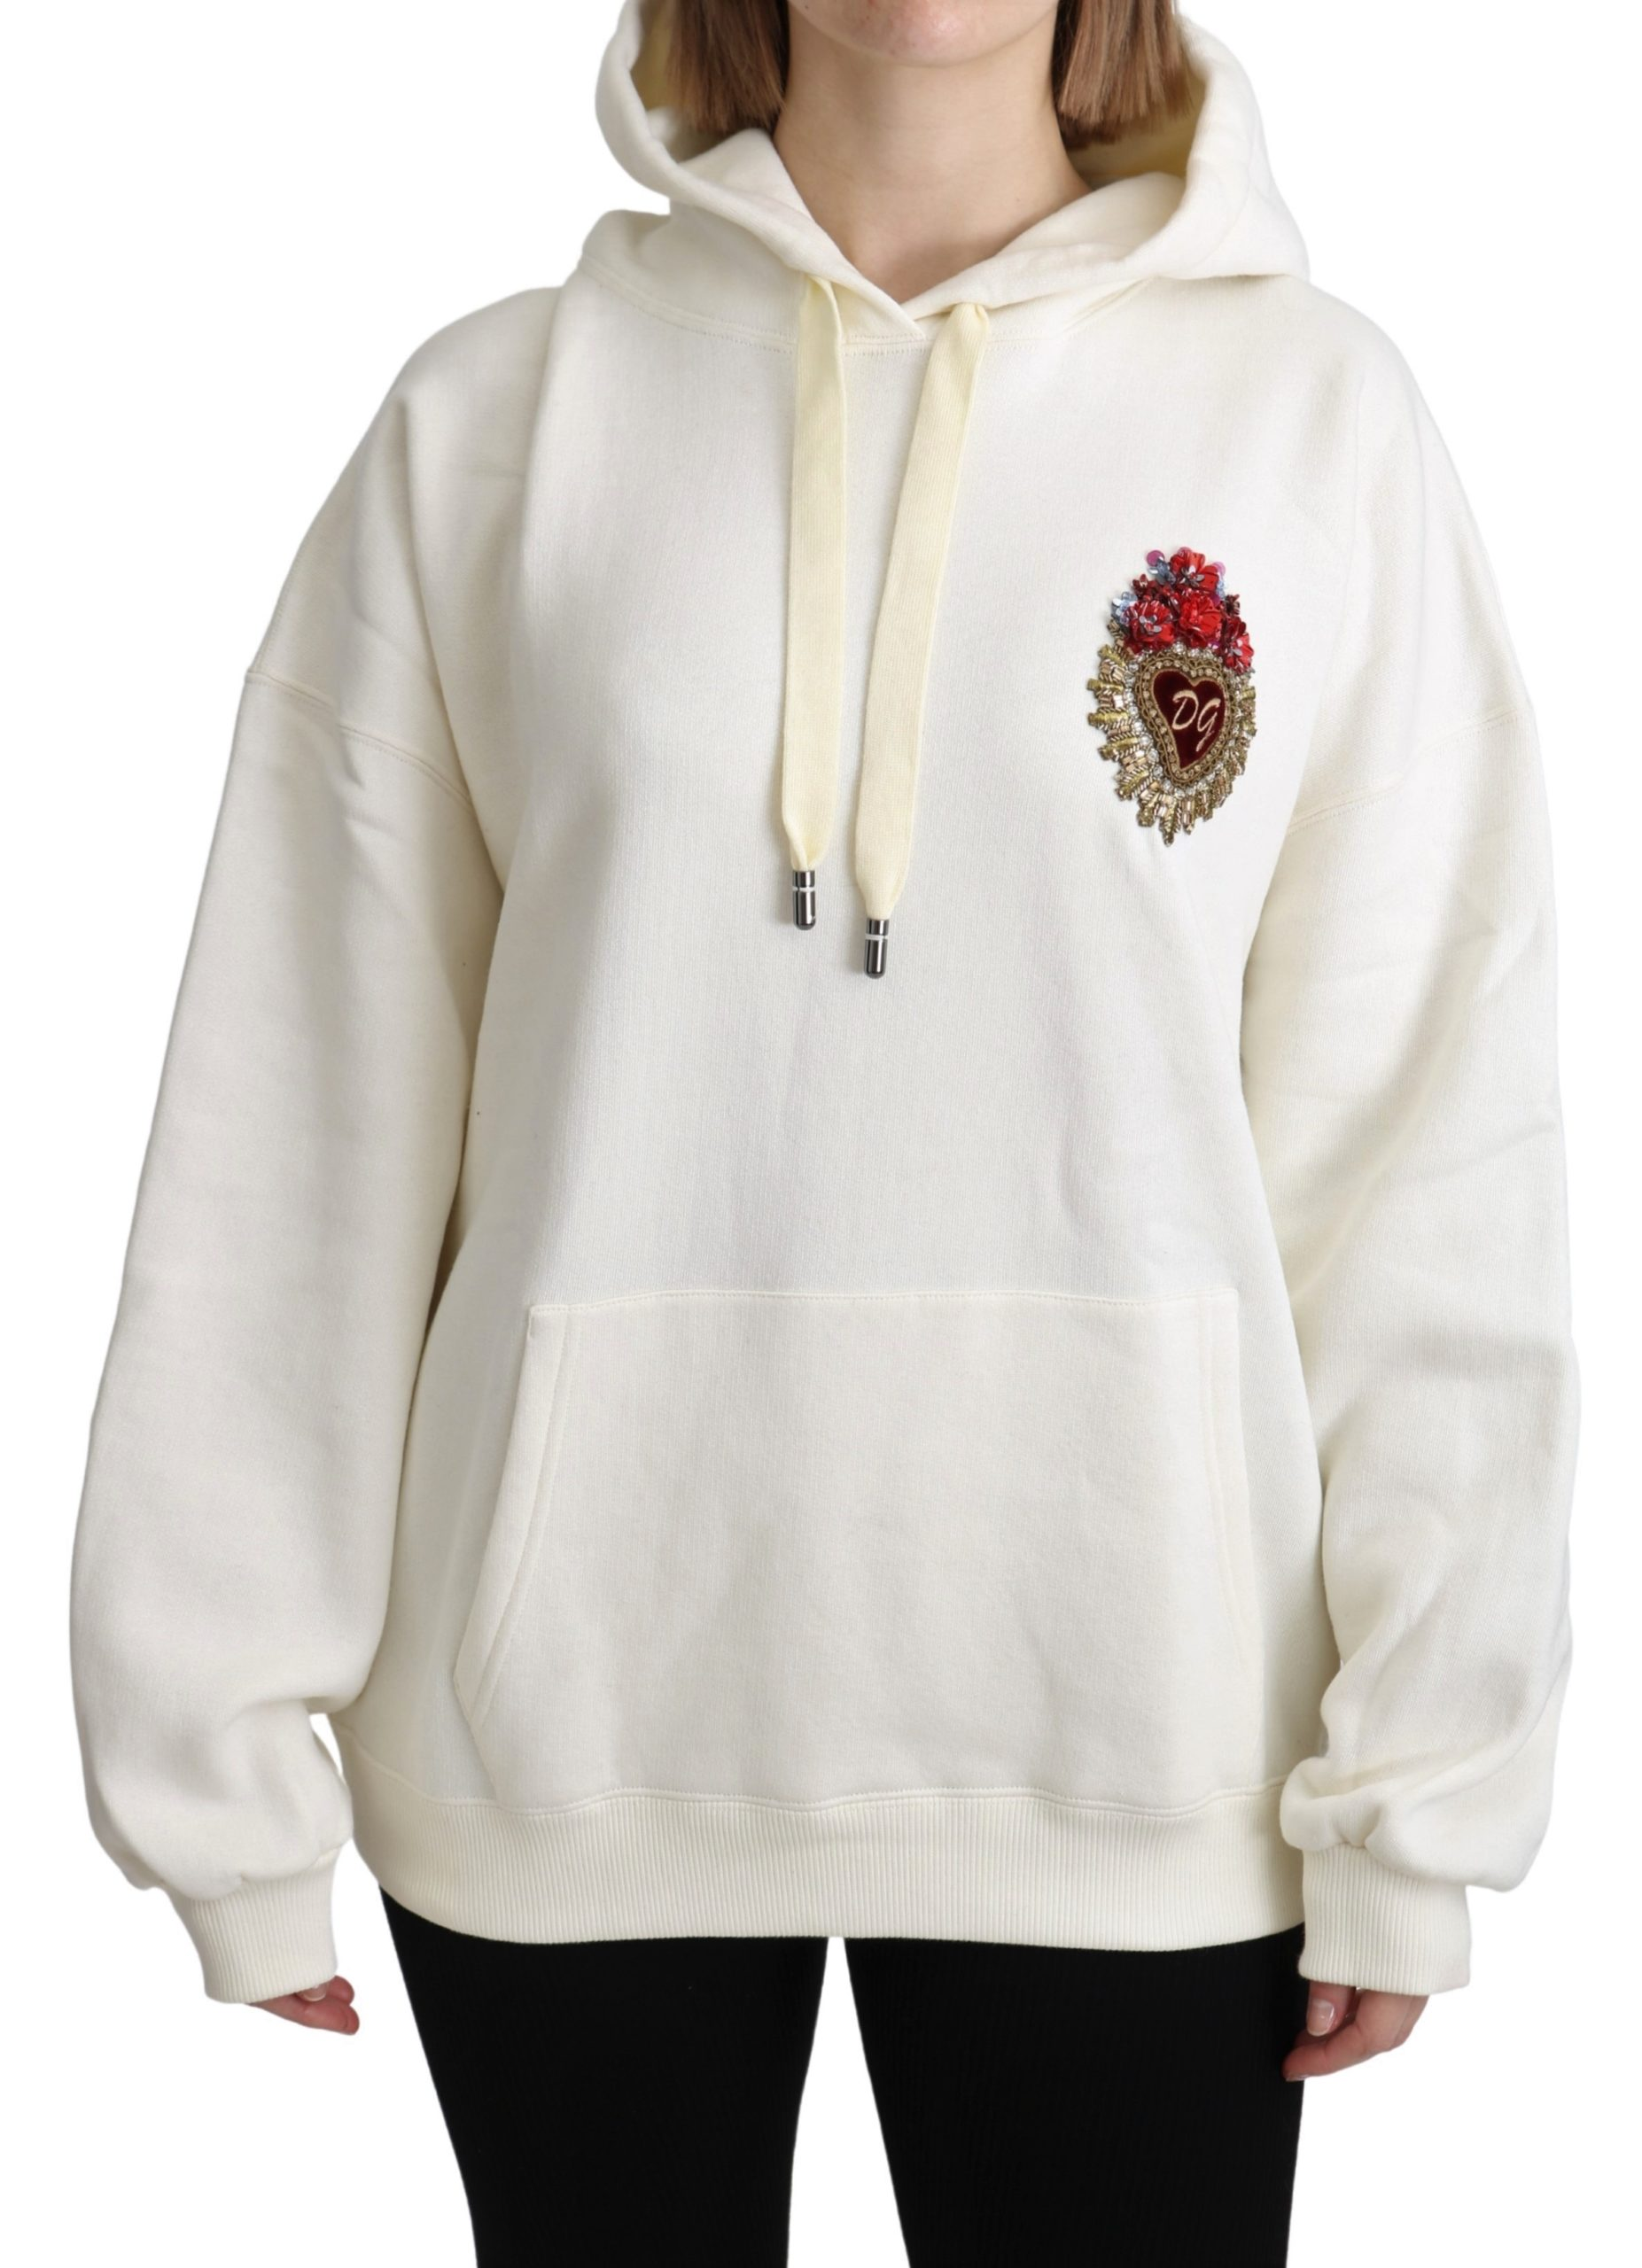 Dolce & Gabbana Women's Crystal Heart Hooded Pullover Sweater White TSH5155 - IT40 S